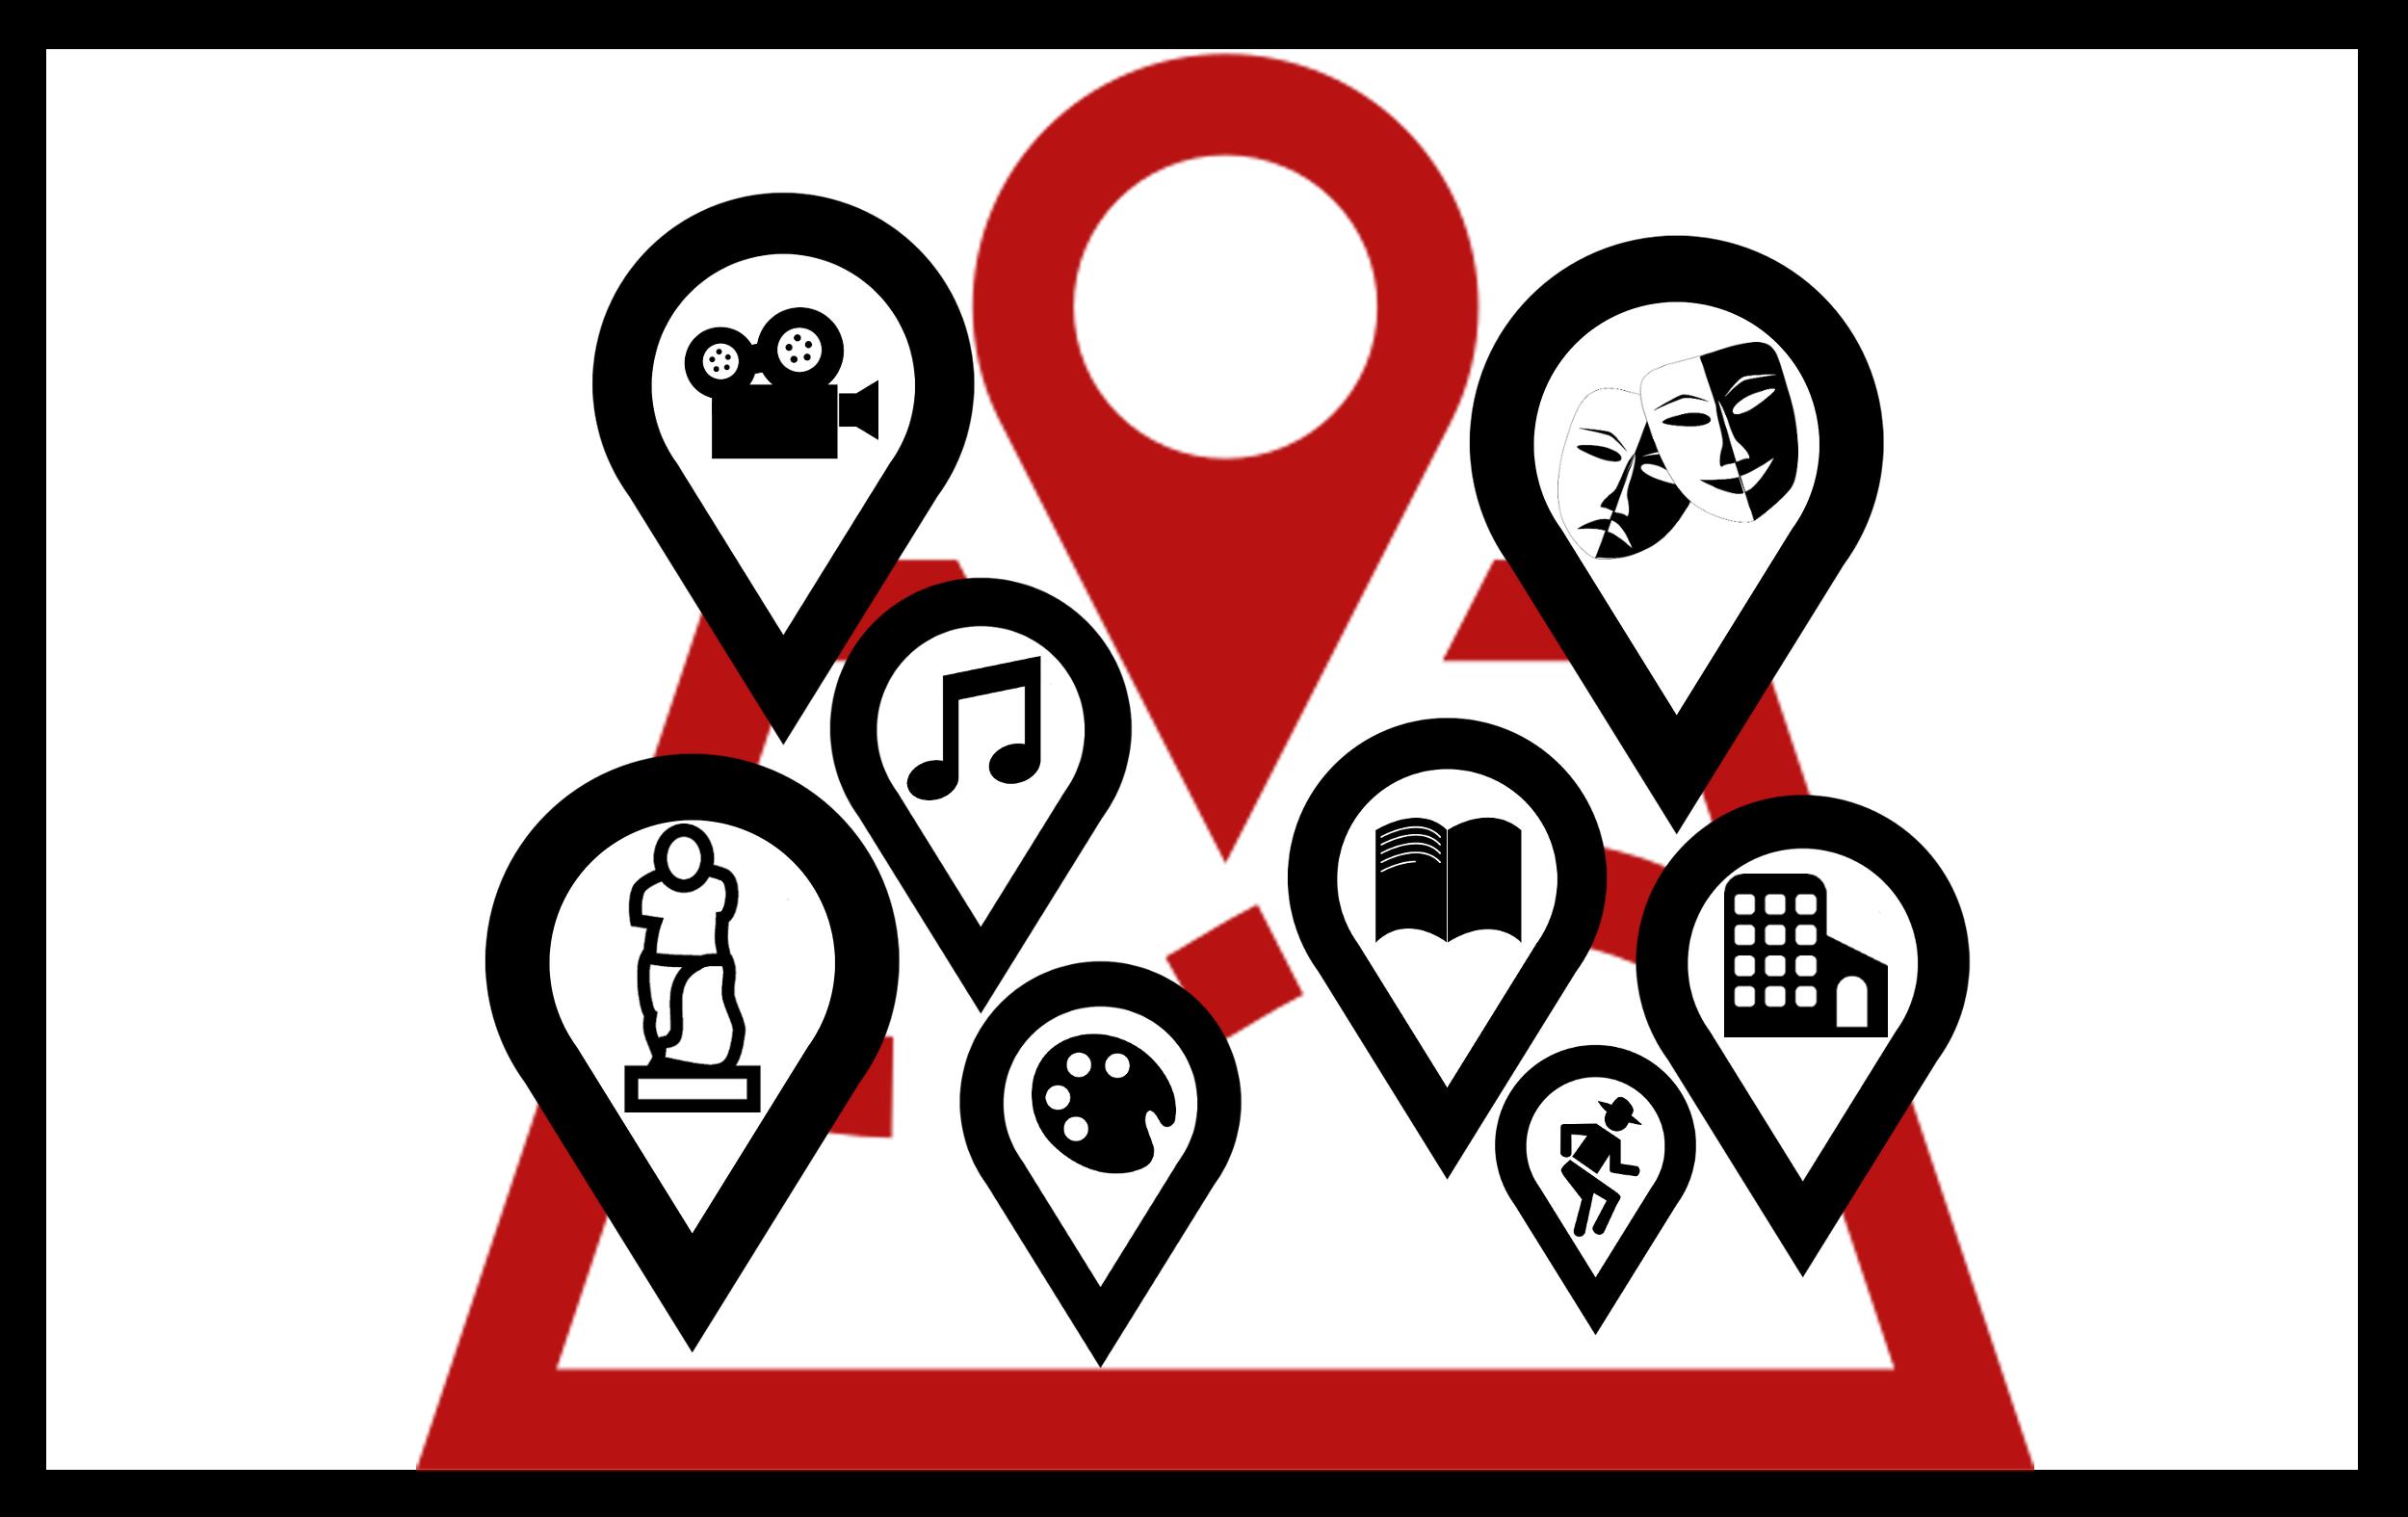 MappaCulturaMainPage